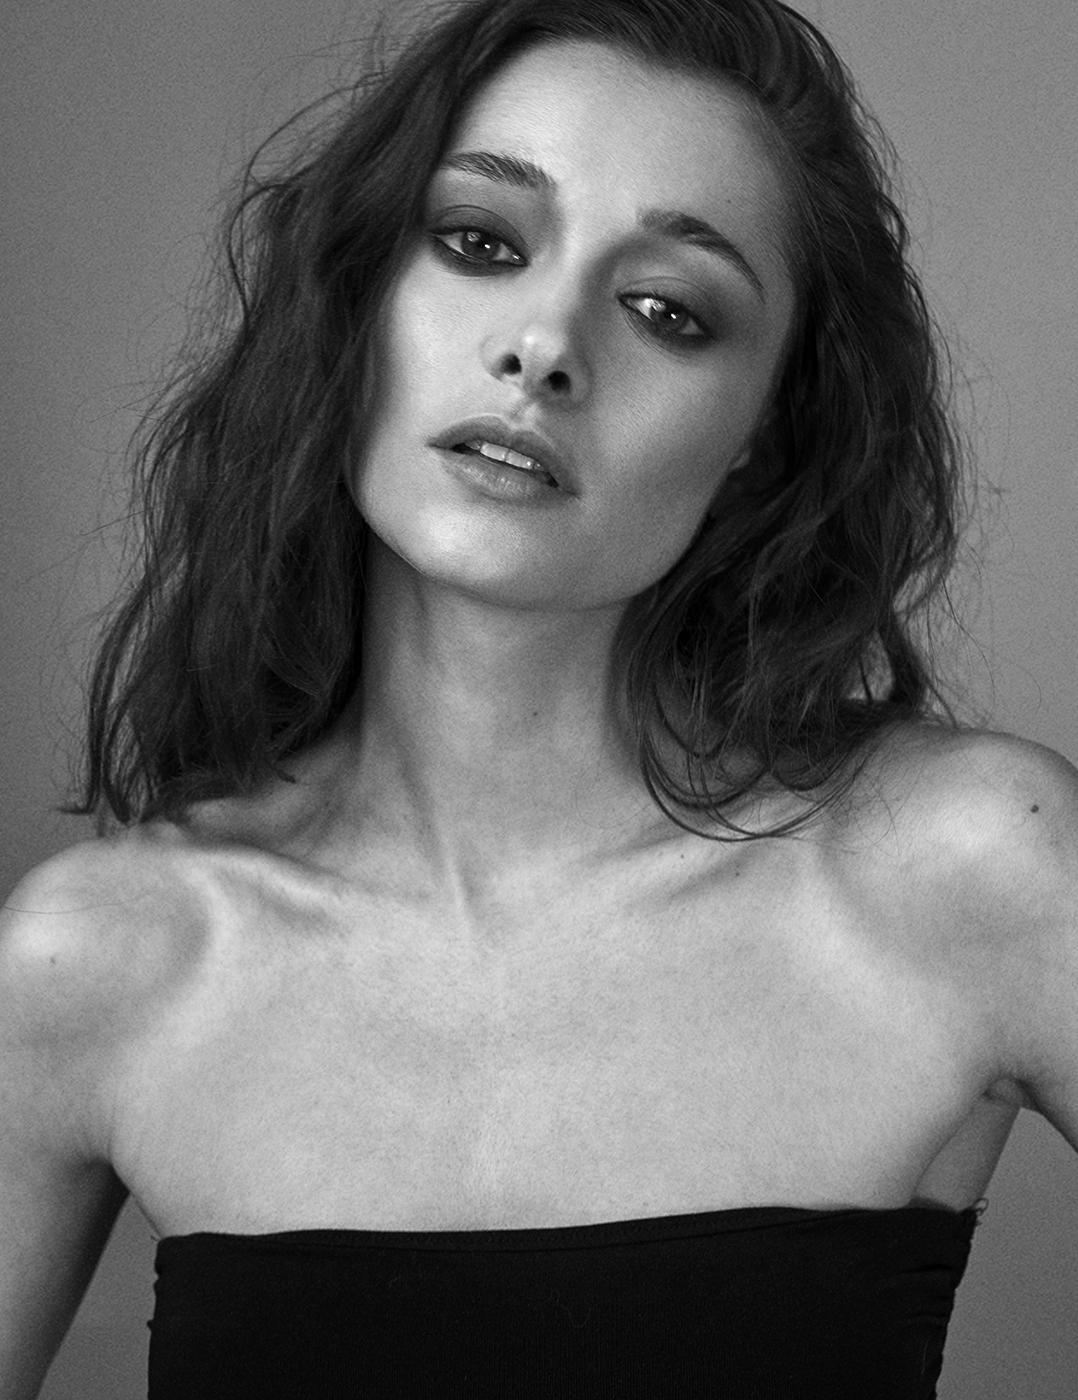 VALERIA GEORGIEVA